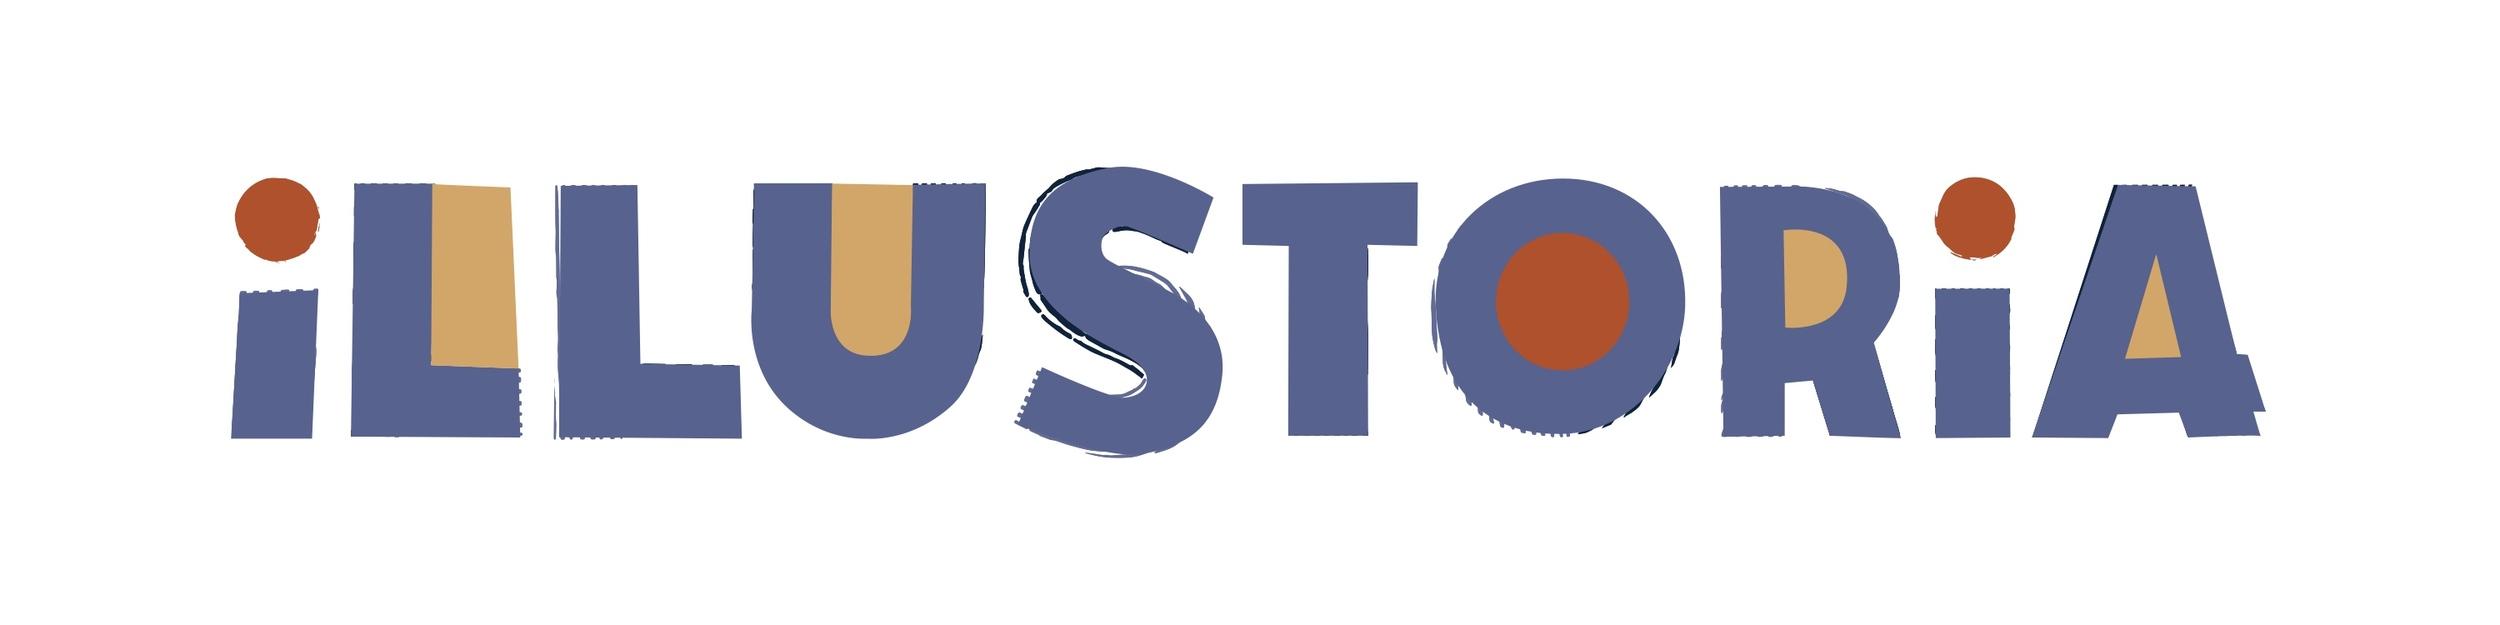 Logo variant #1